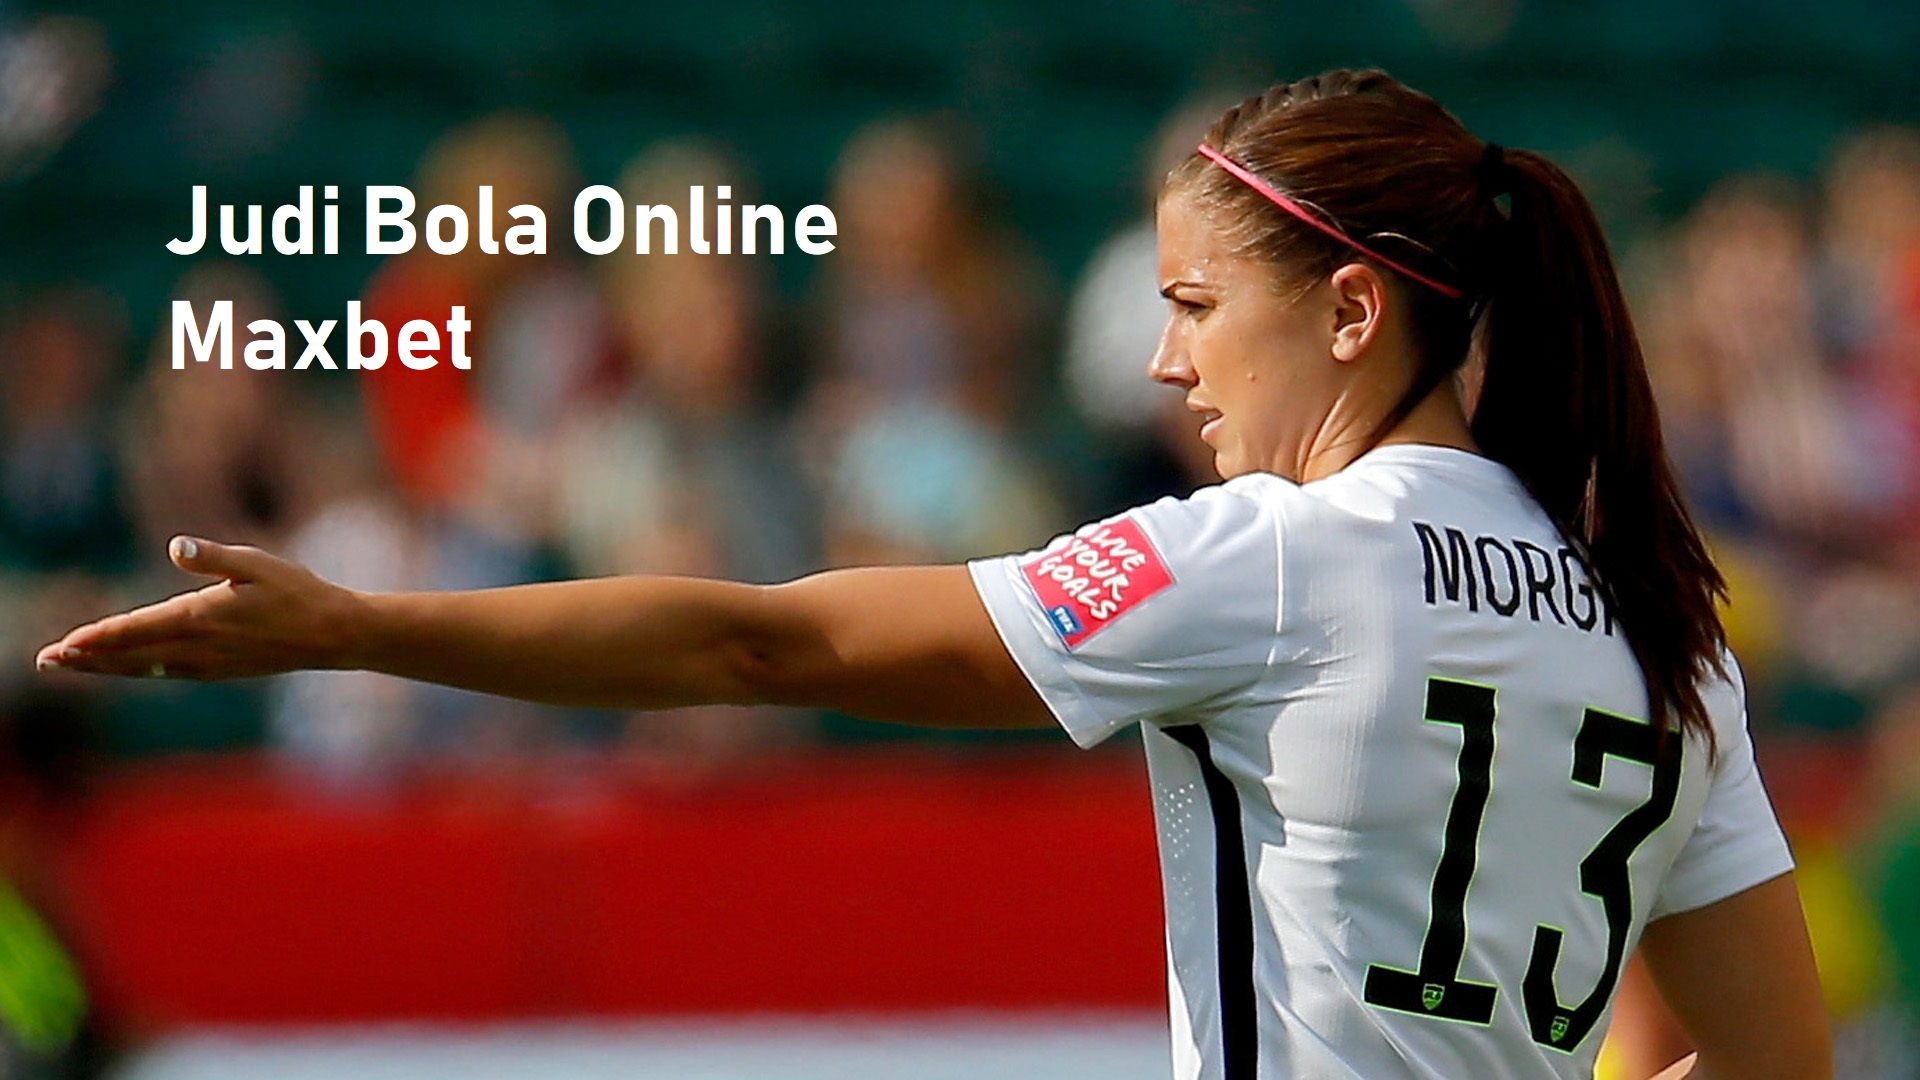 Judi Bola Online Maxbet